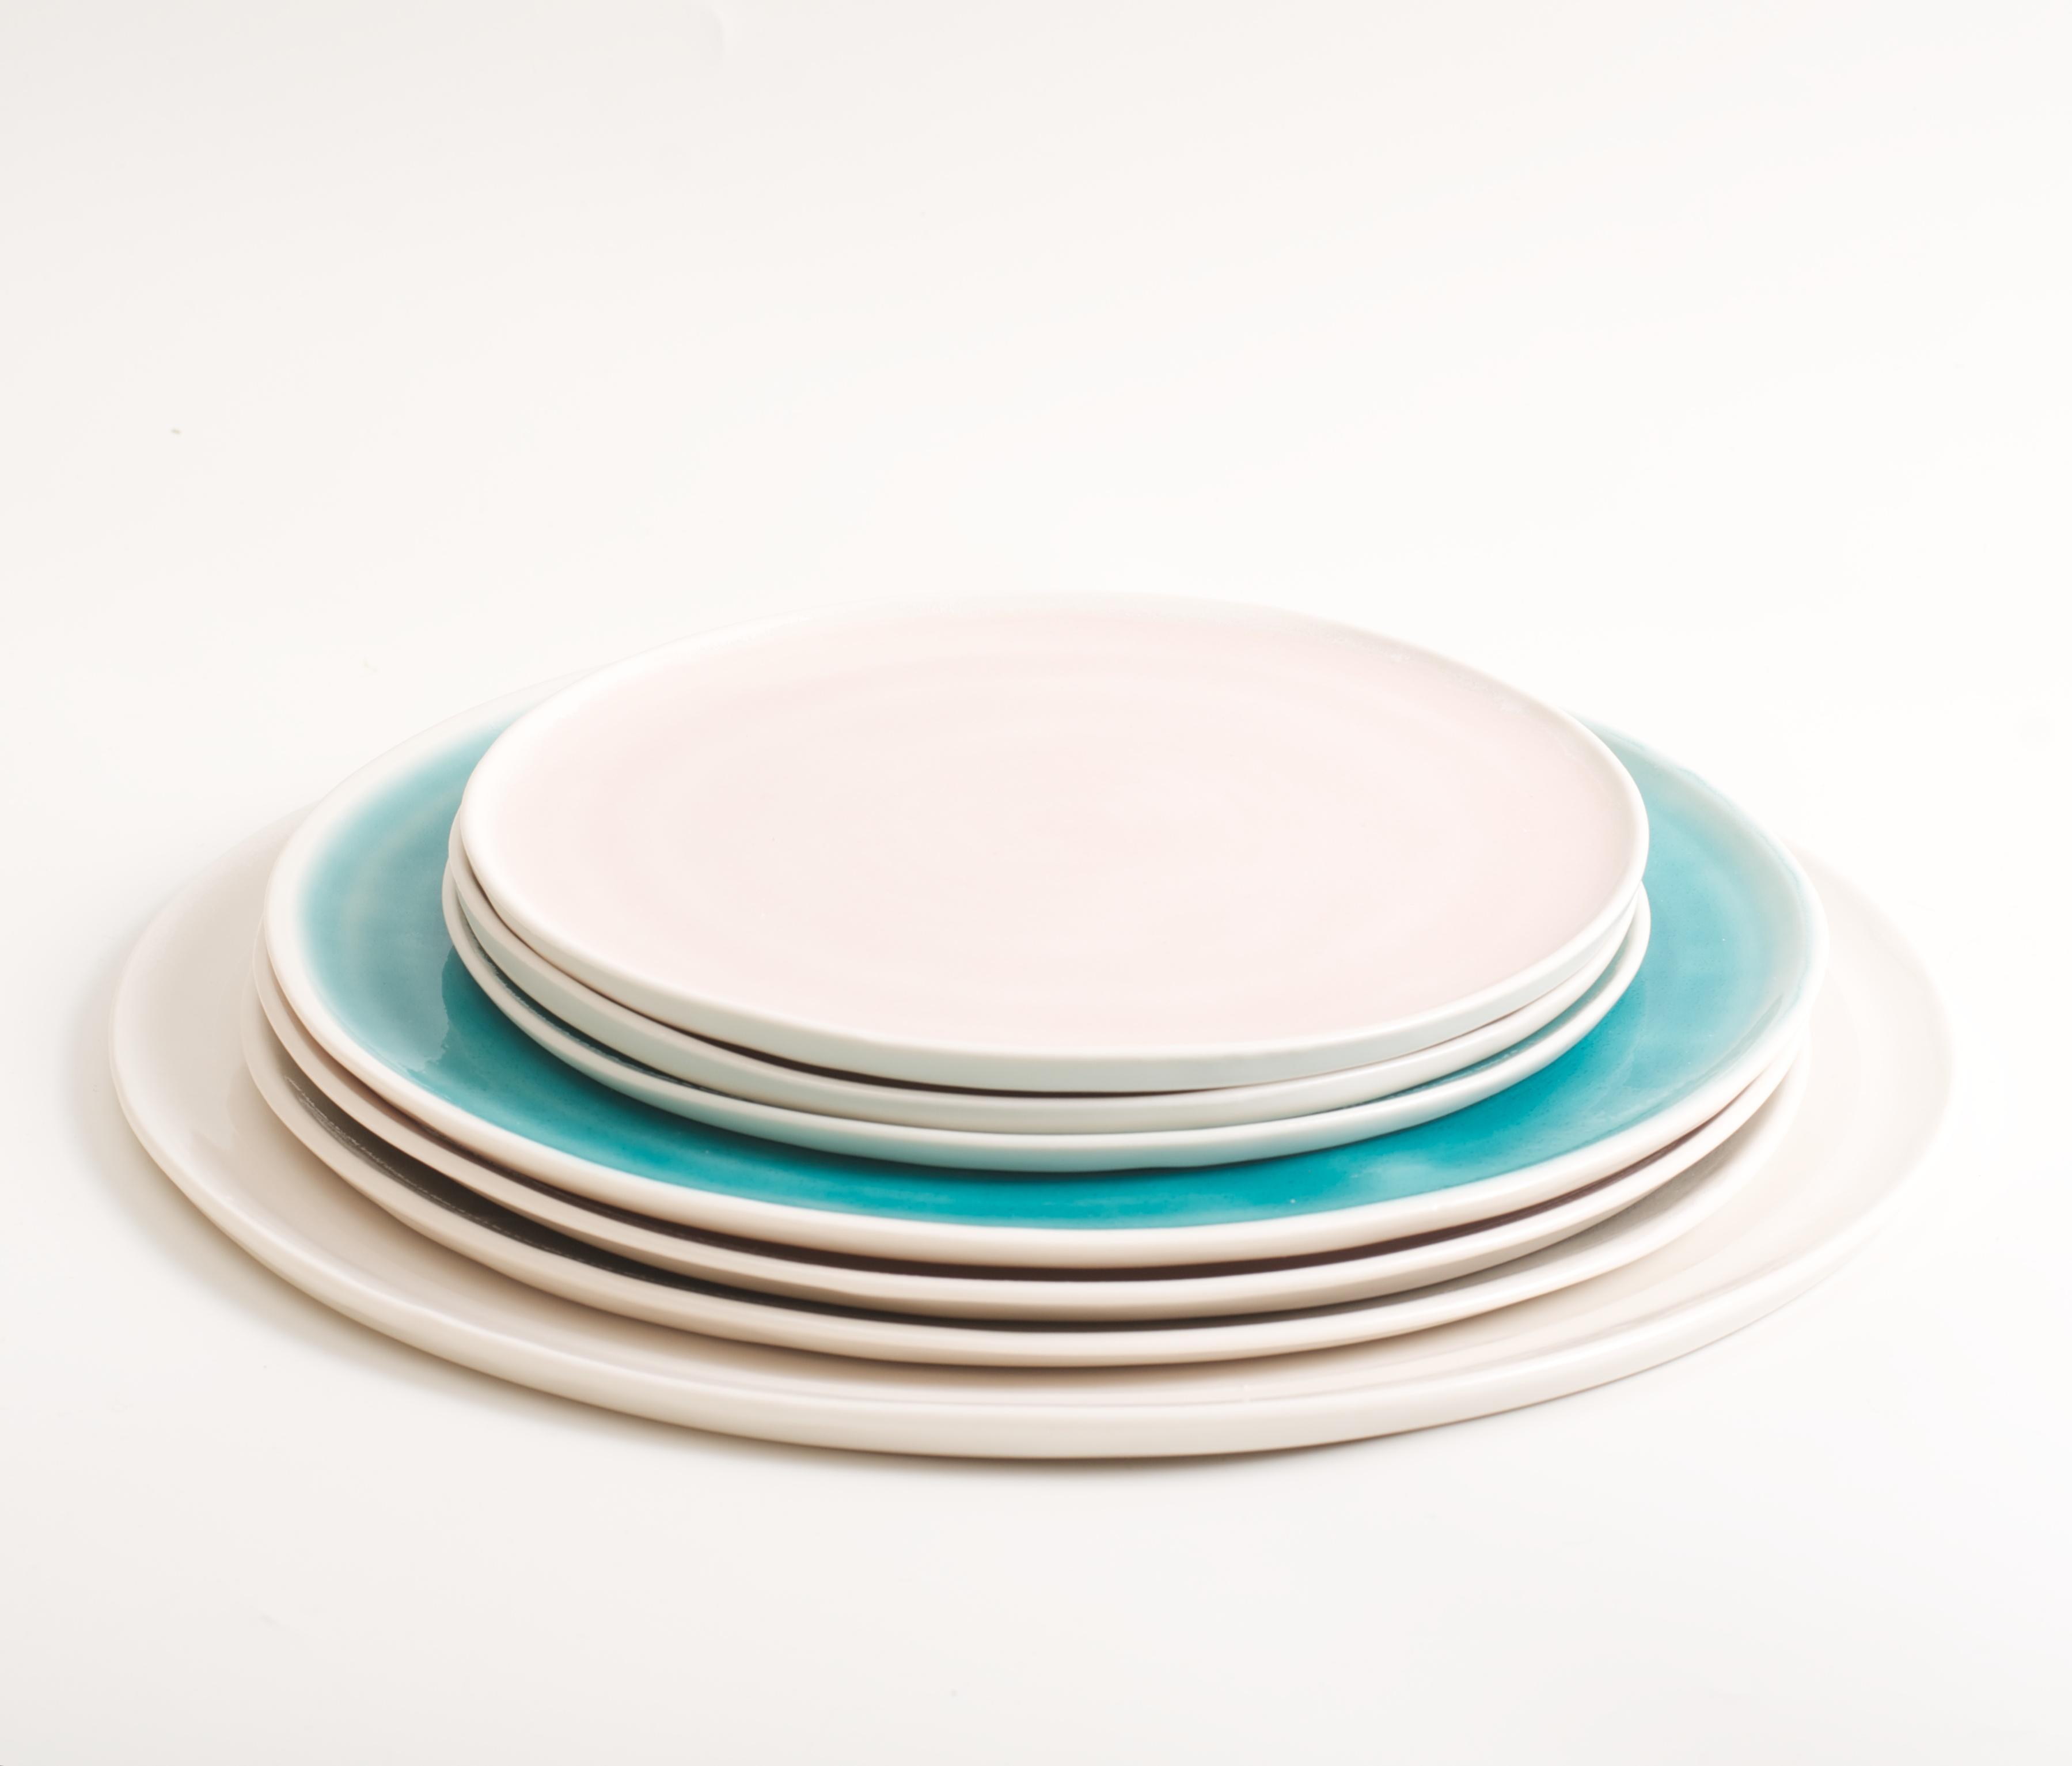 handmade porcelain- tableware- dinnerware- plate- dining- grey- pink- turquoise  sc 1 st  Linda Bloomfield & Handmade plate | Linda Bloomfield